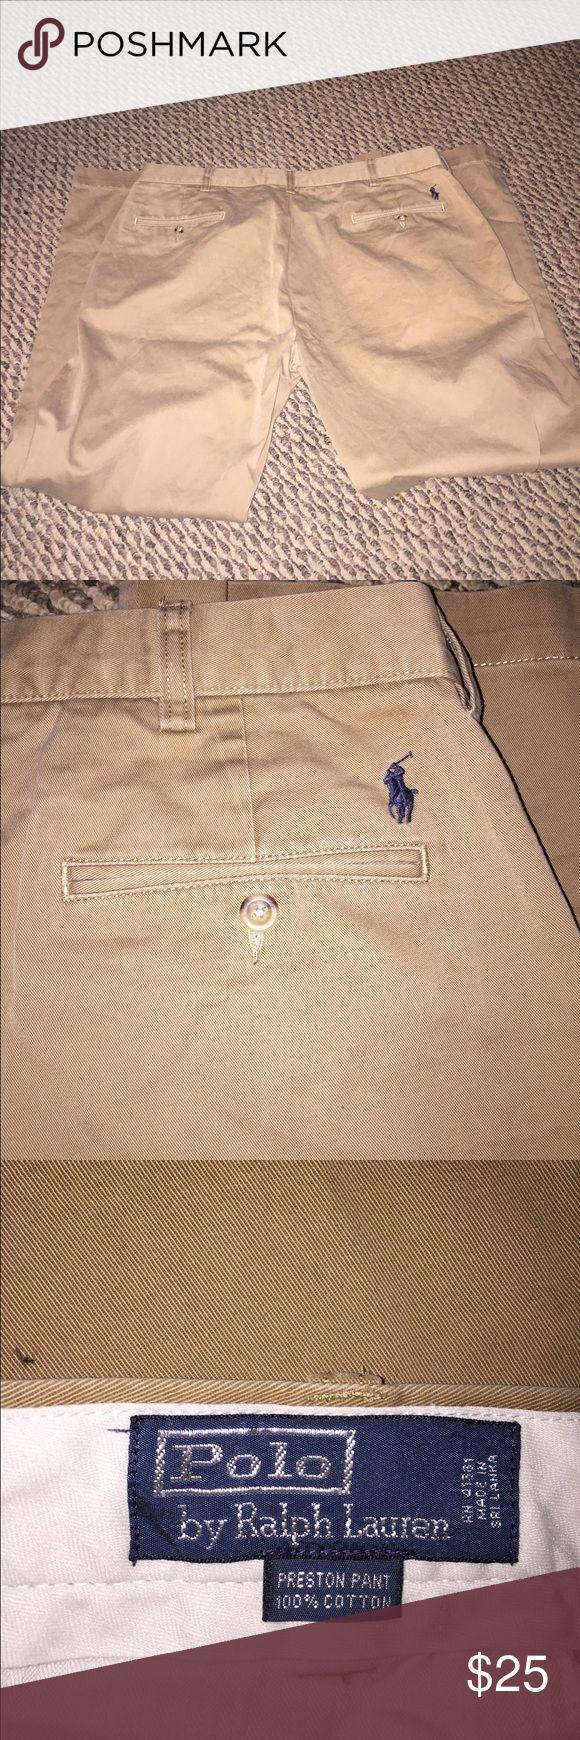 Polo Ralph Lauren khaki's for men. Sz. 38x32. Polo Ralph Lauren khaki's. Men's size 38x32. Great price. Polo by Ralph Lauren Pants Chinos & Khakis